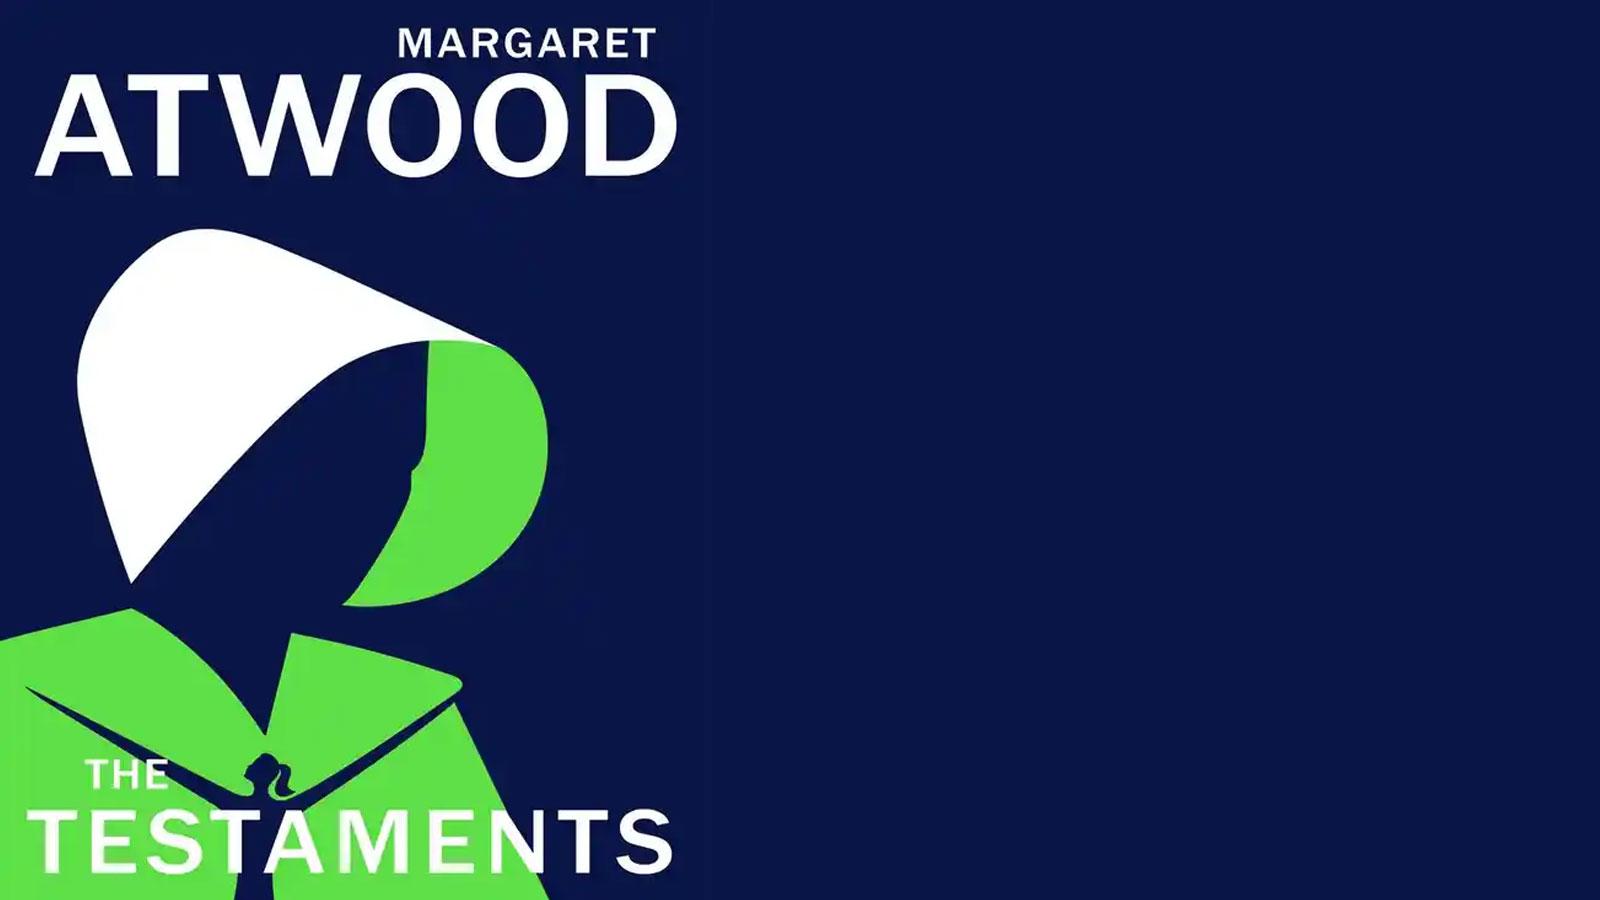 Amazon breaks embargo on Margaret Atwood's Handmaid's Tale